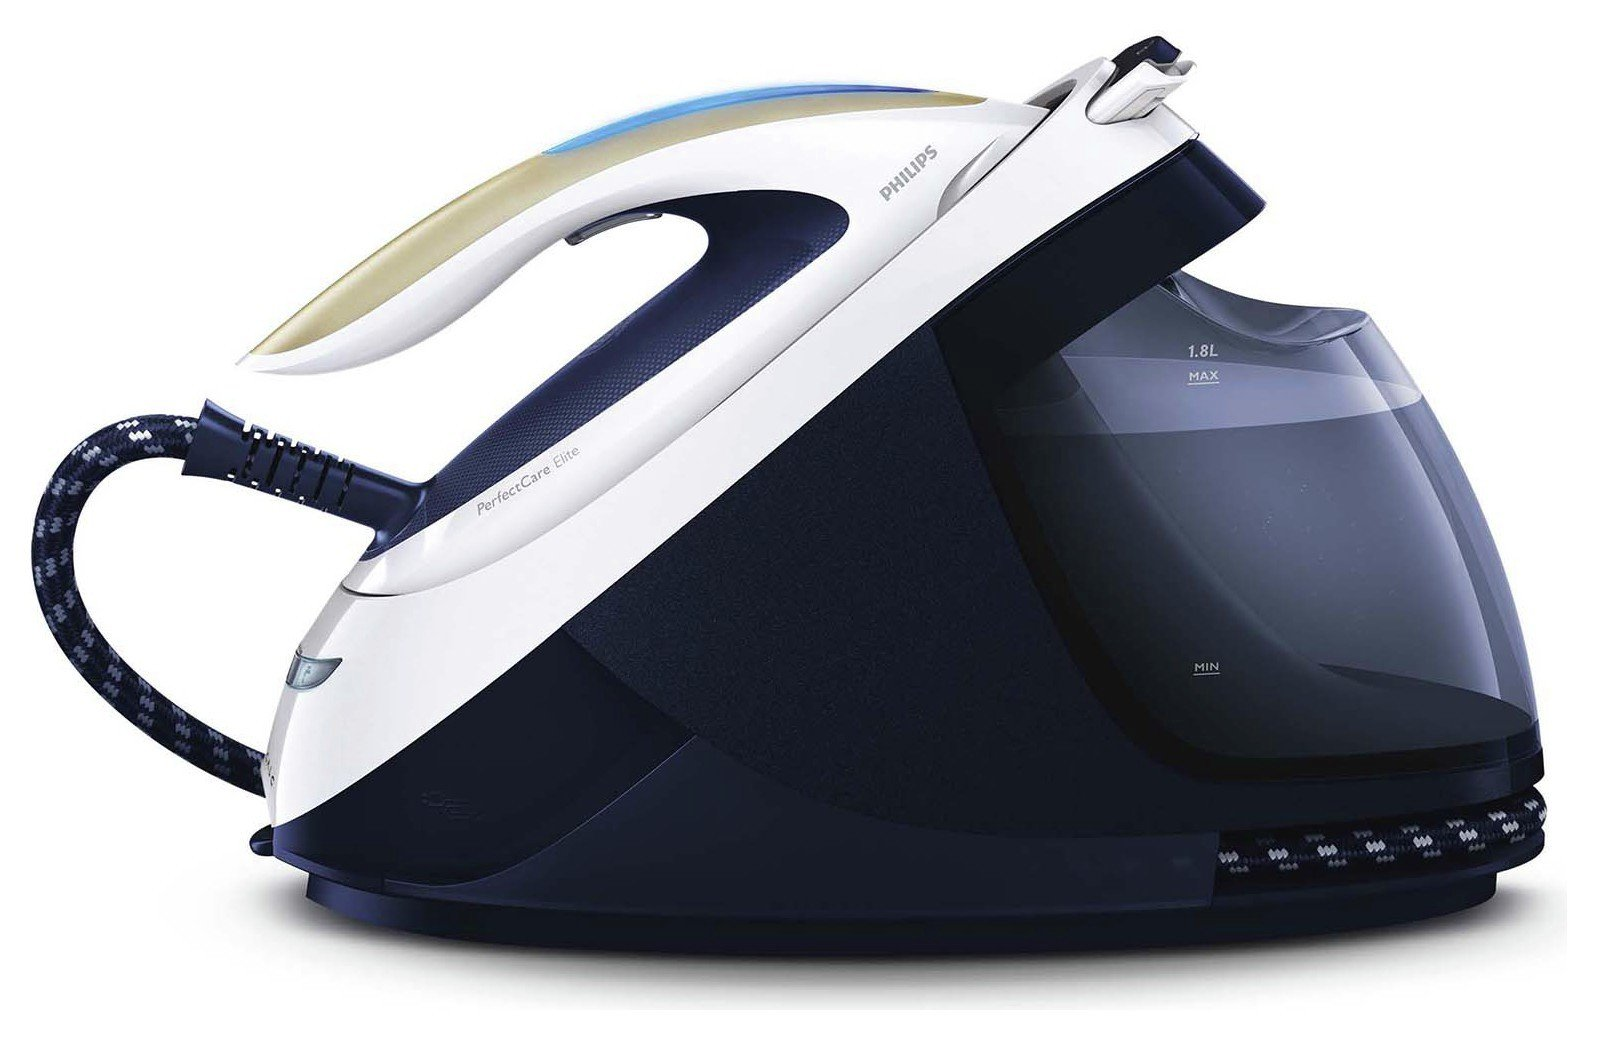 Philips GC9630/20 PerfectCare Elite OneTemp Steam Gen Iron